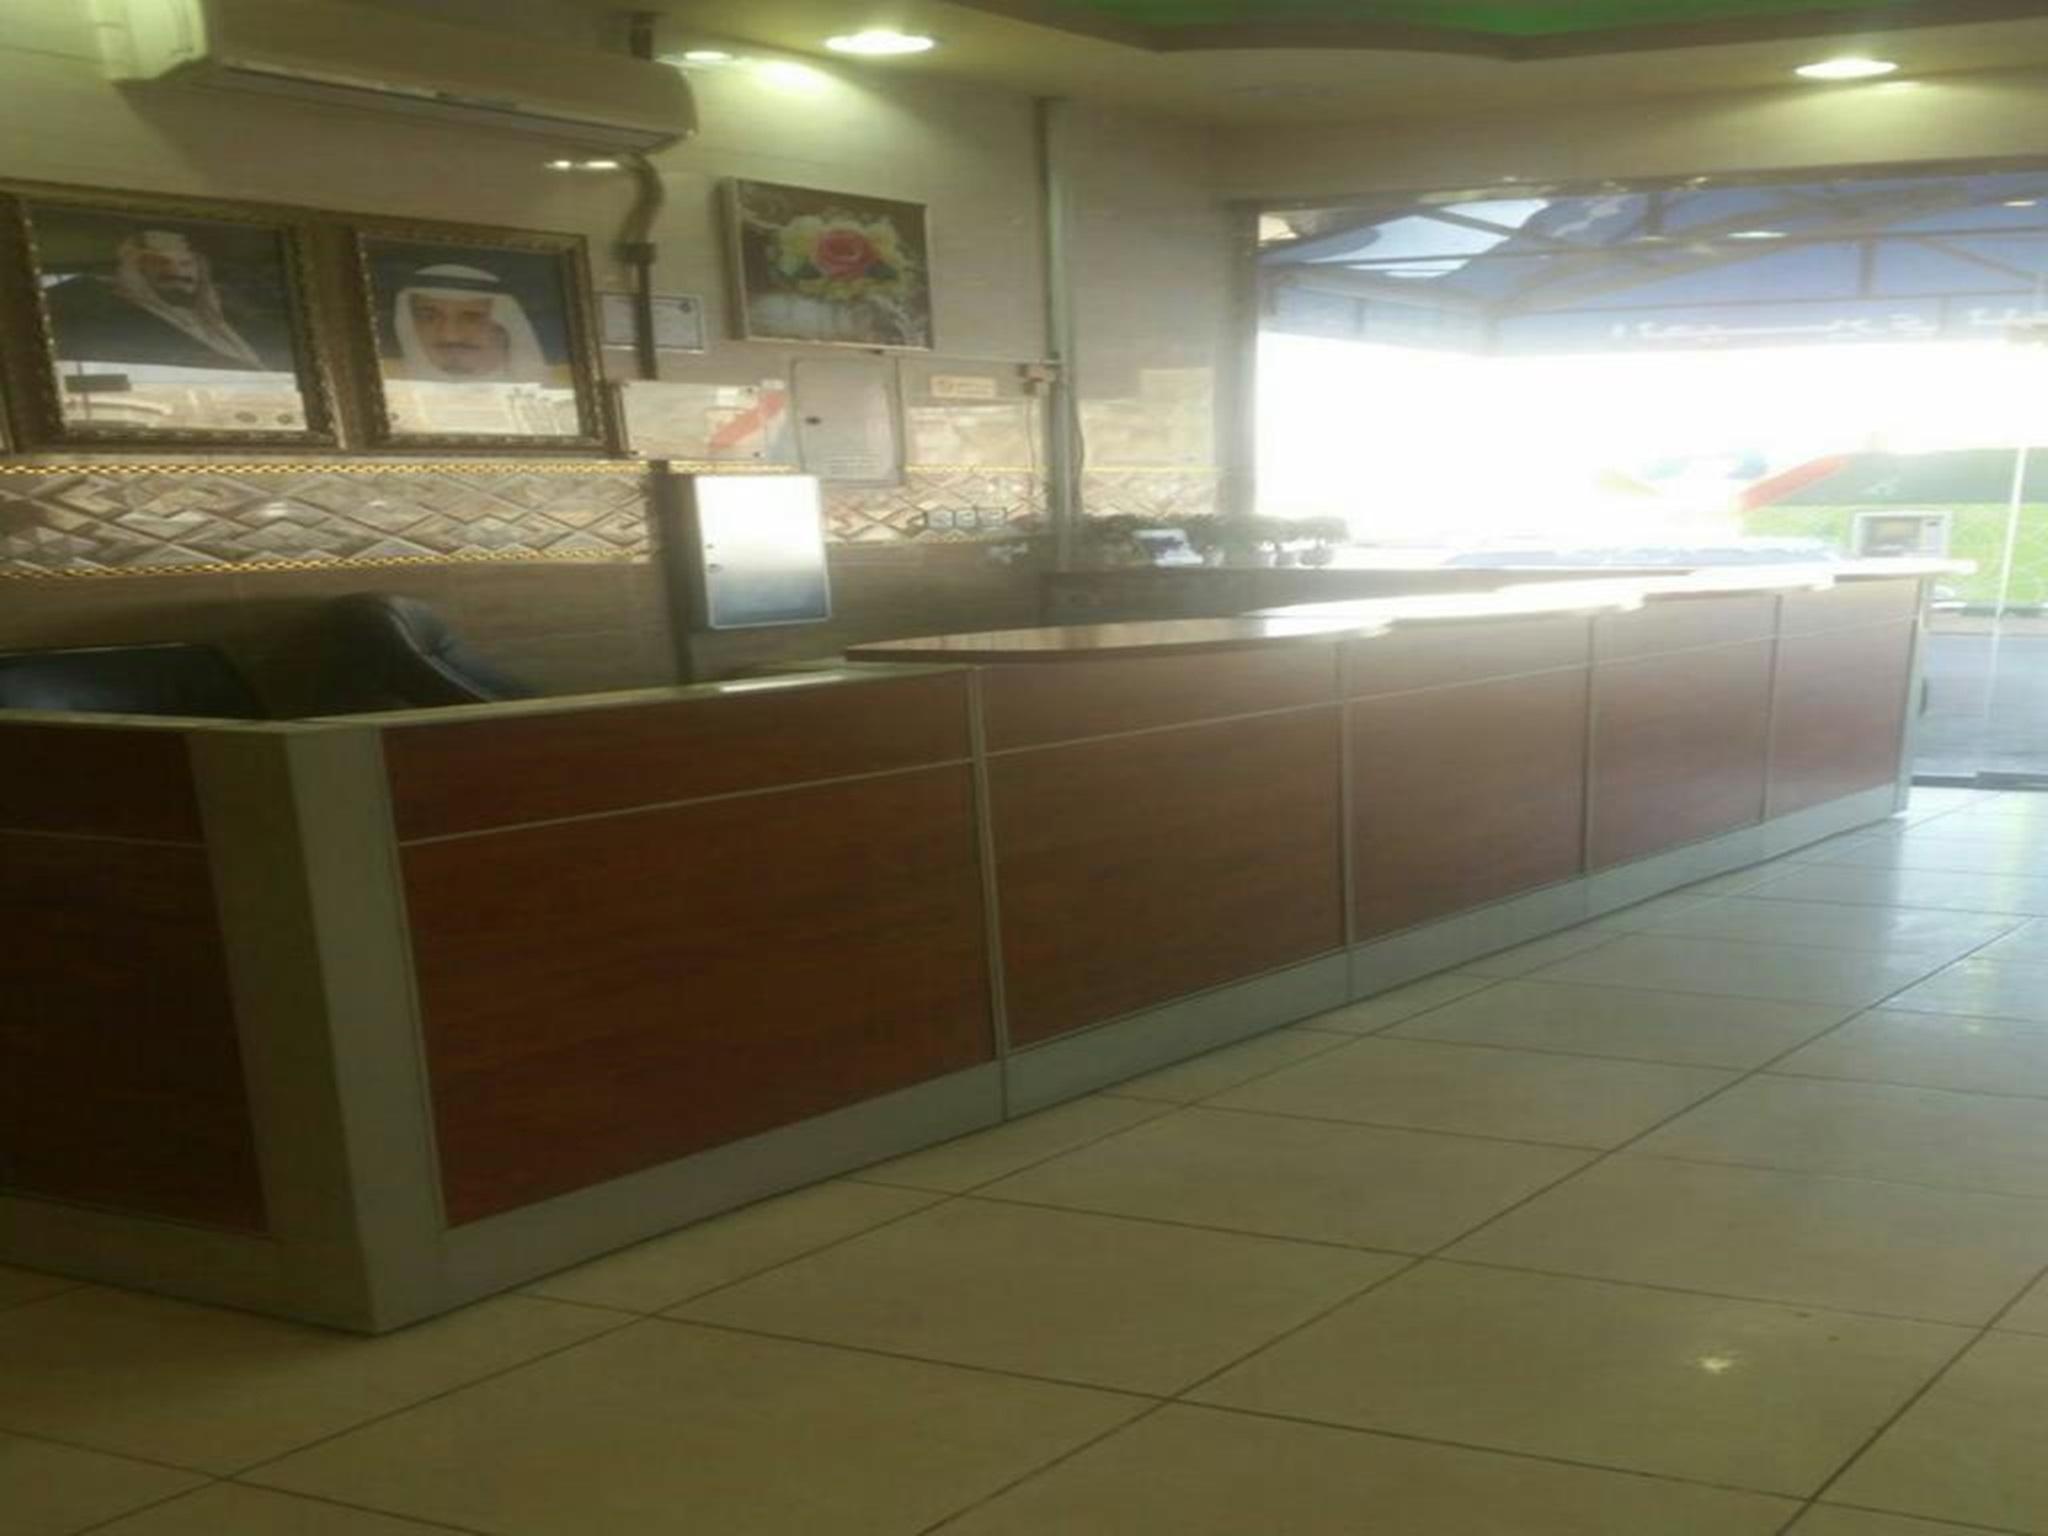 Al Eairy Apartments Tabuk 2